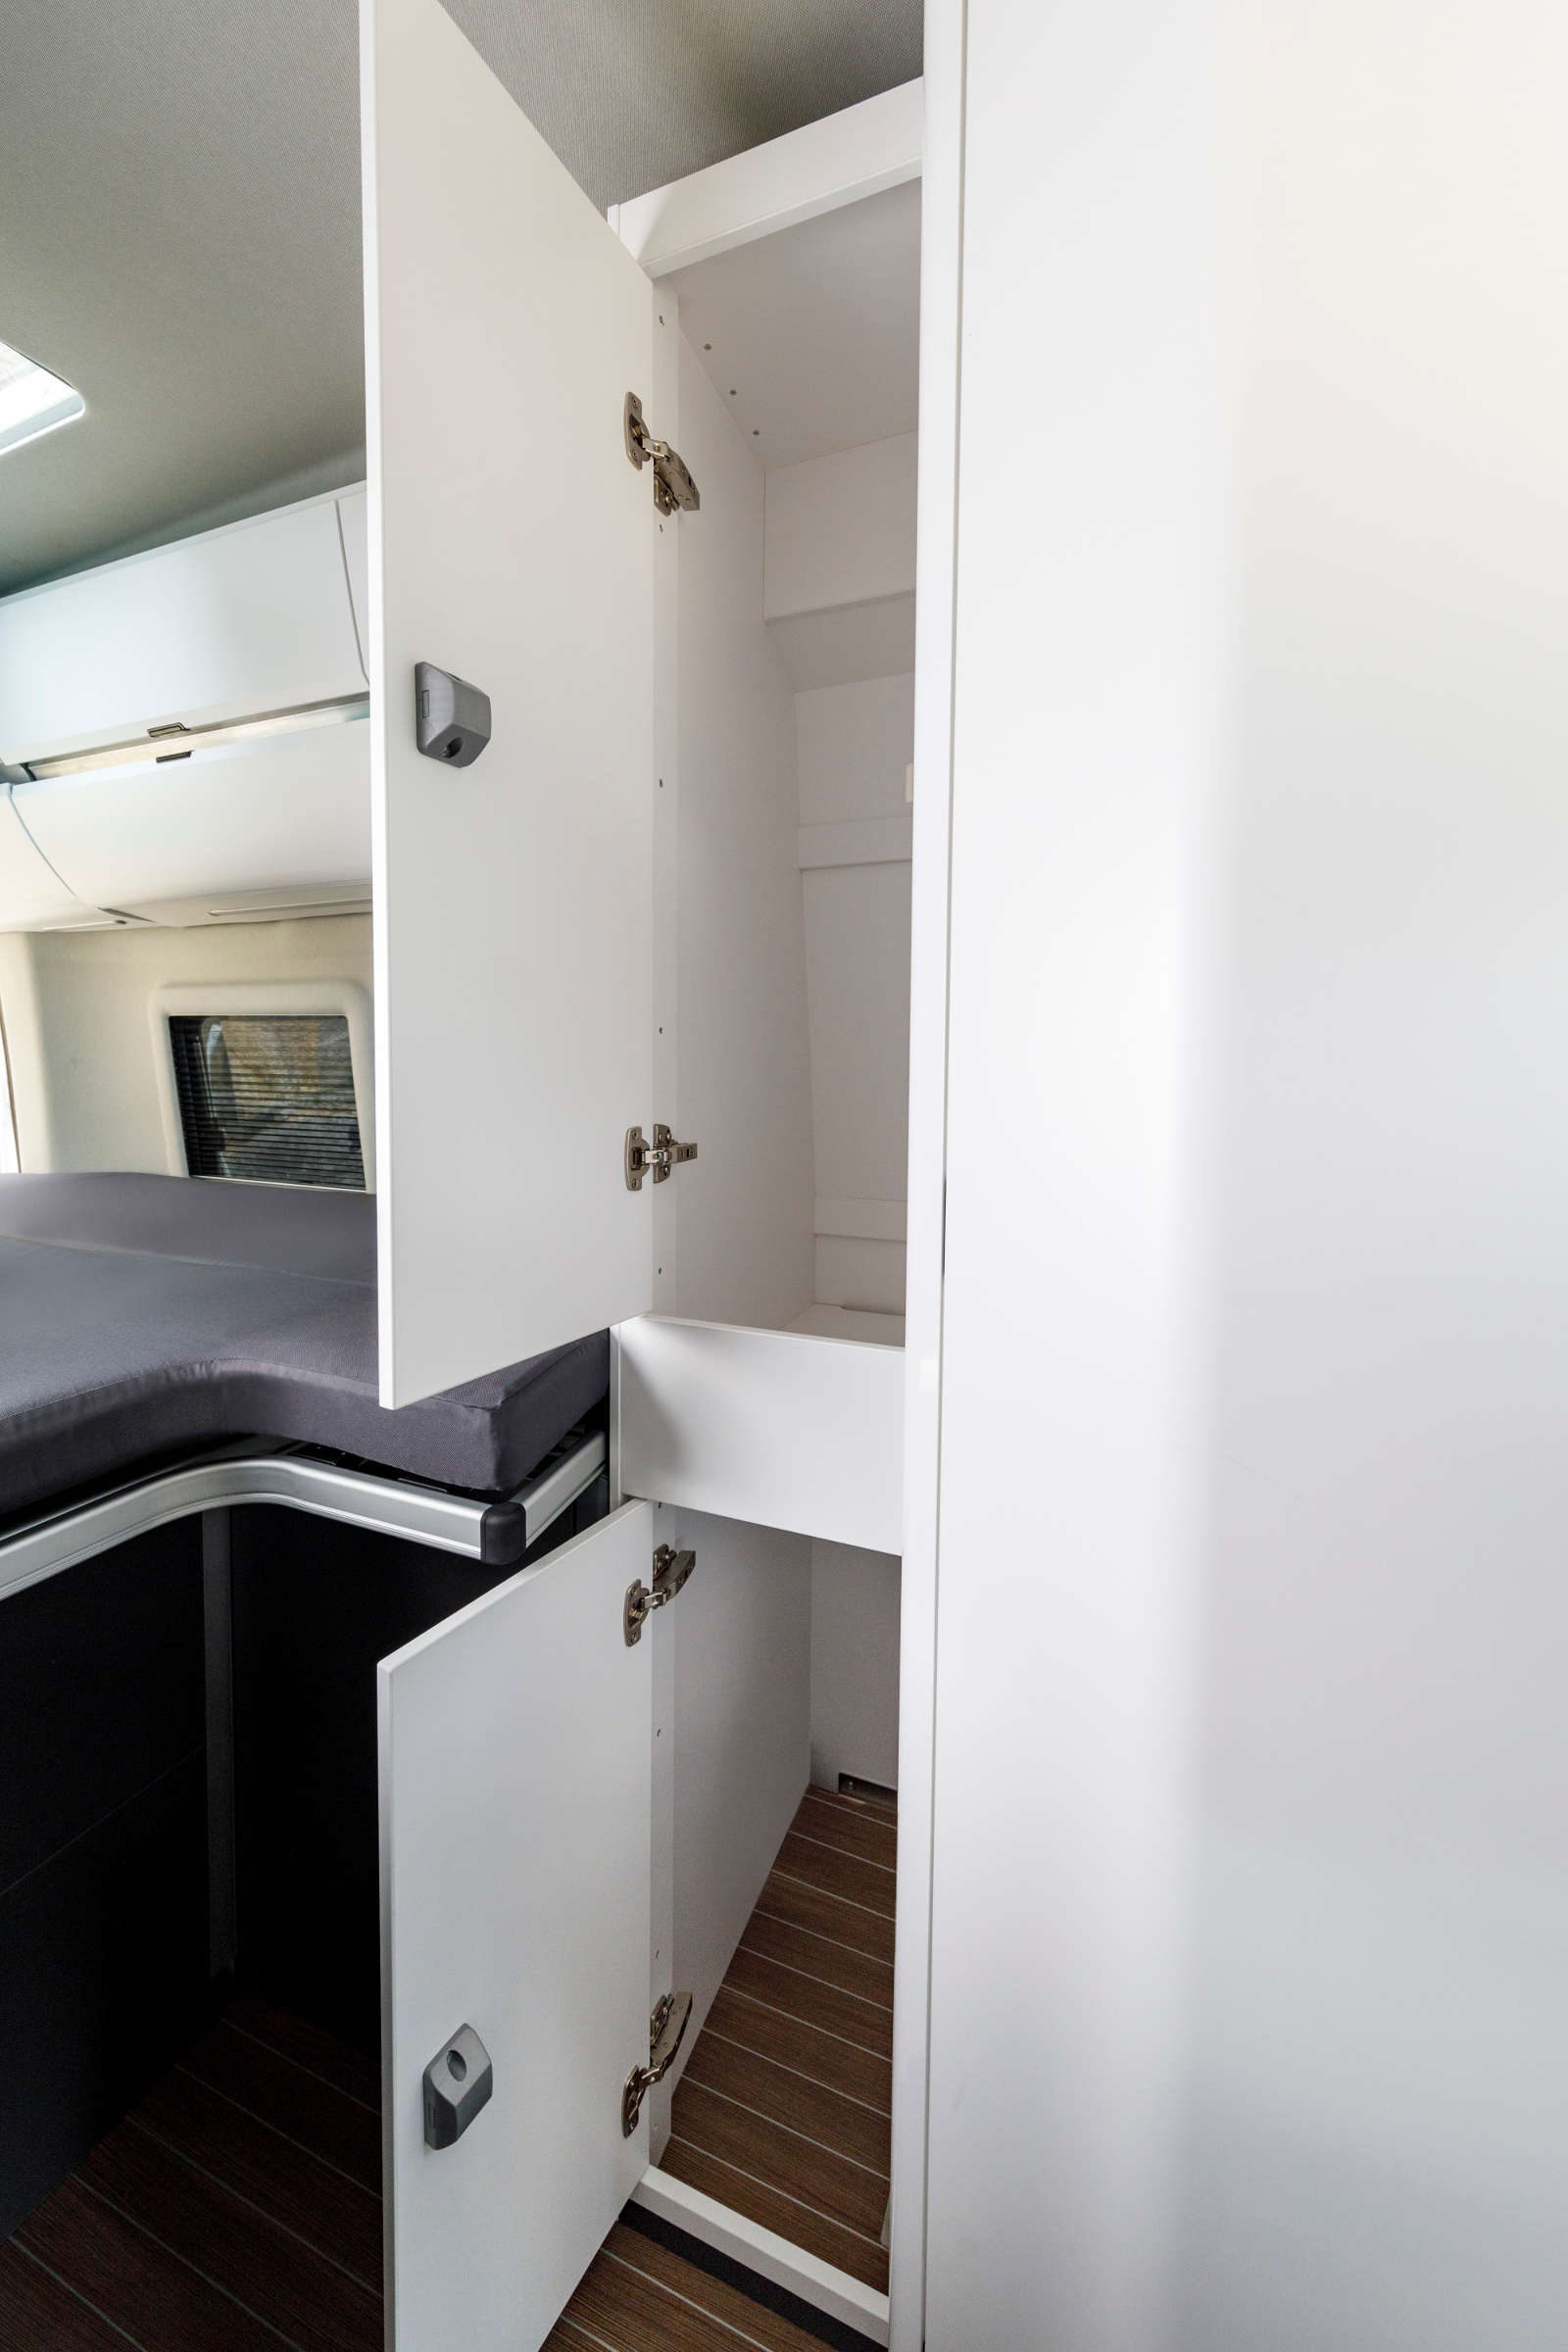 vw grand california gr er und besser als der t6. Black Bedroom Furniture Sets. Home Design Ideas